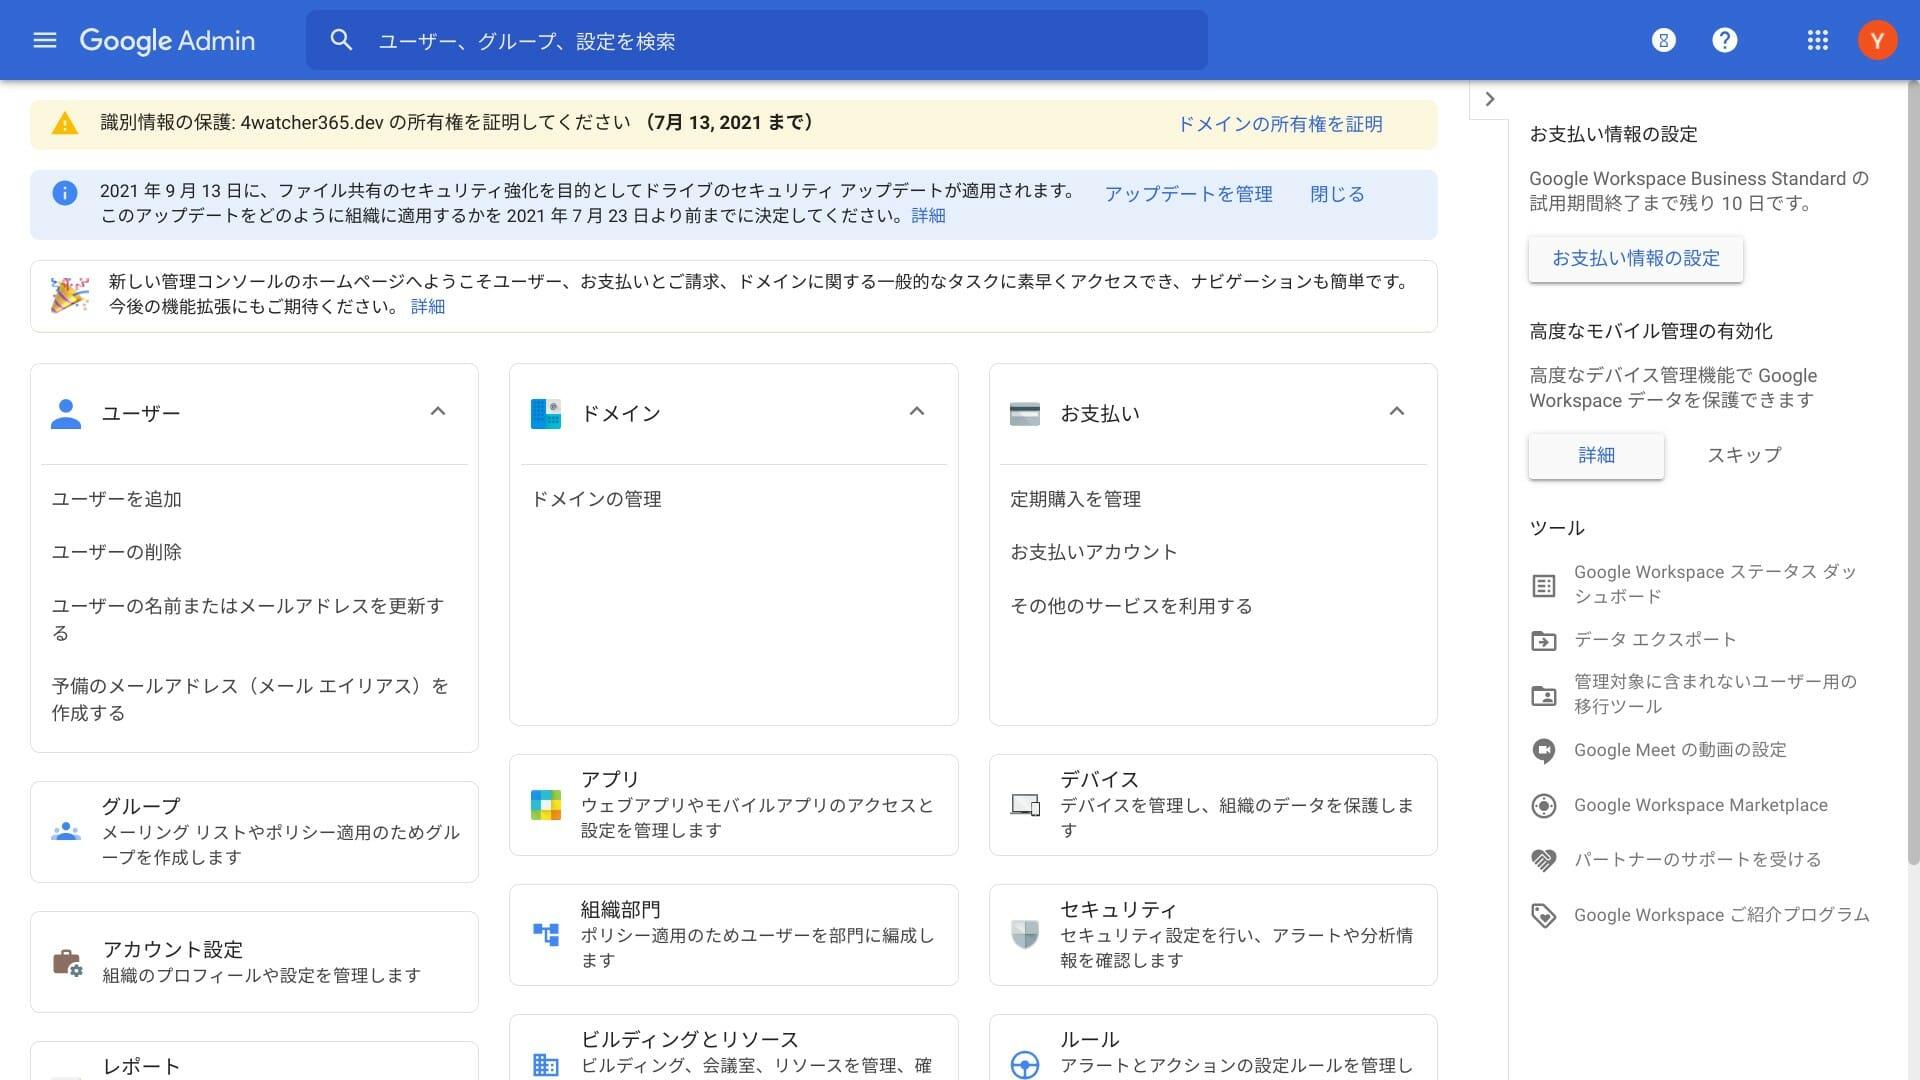 Google 管理コンソール:ダッシュボード